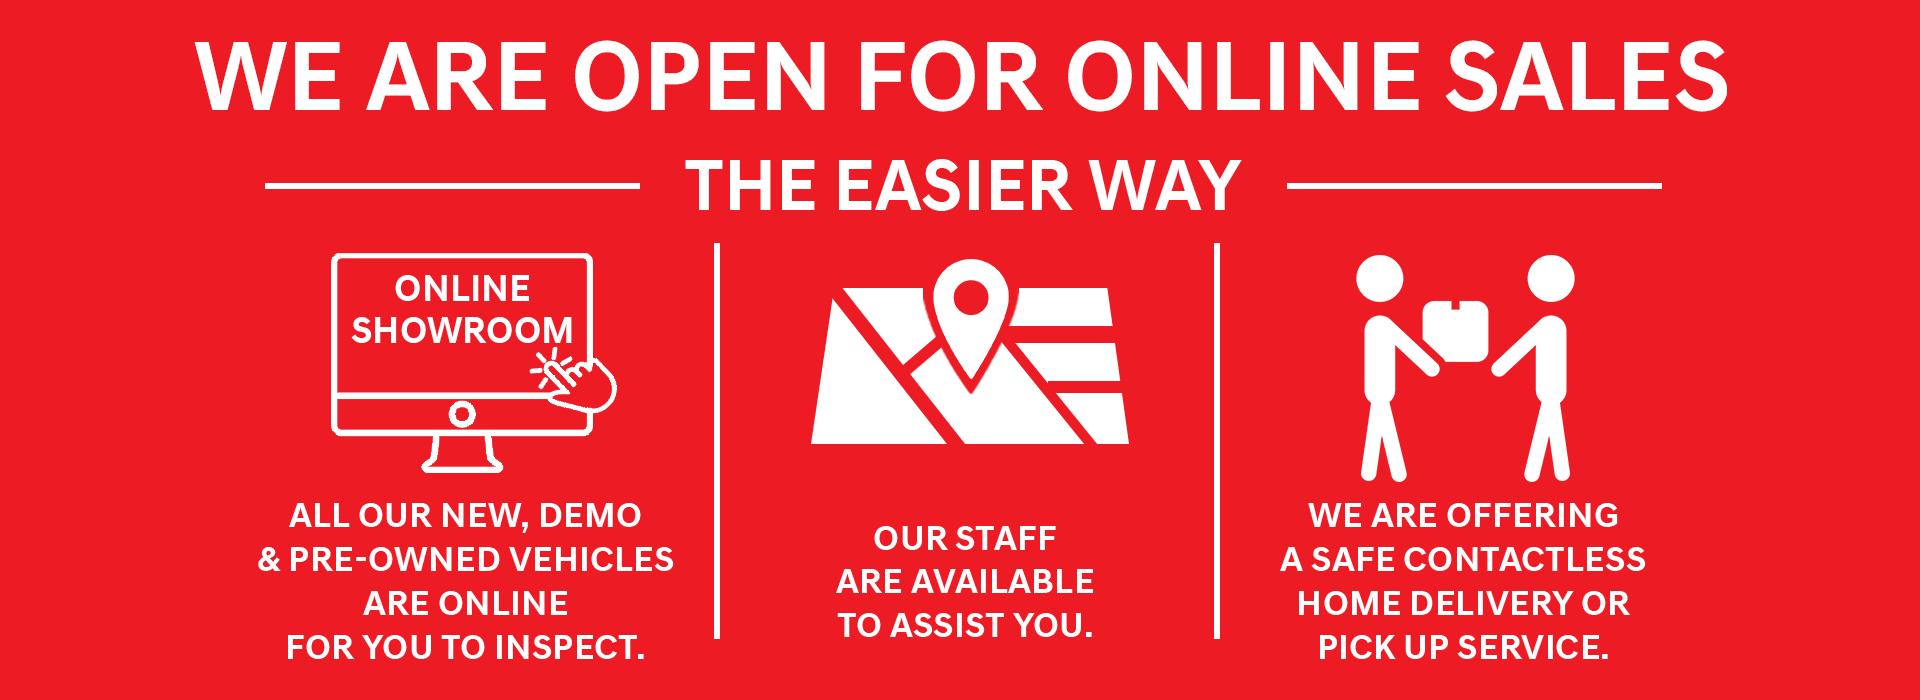 Cranbourne Mitsubishi - We are open online